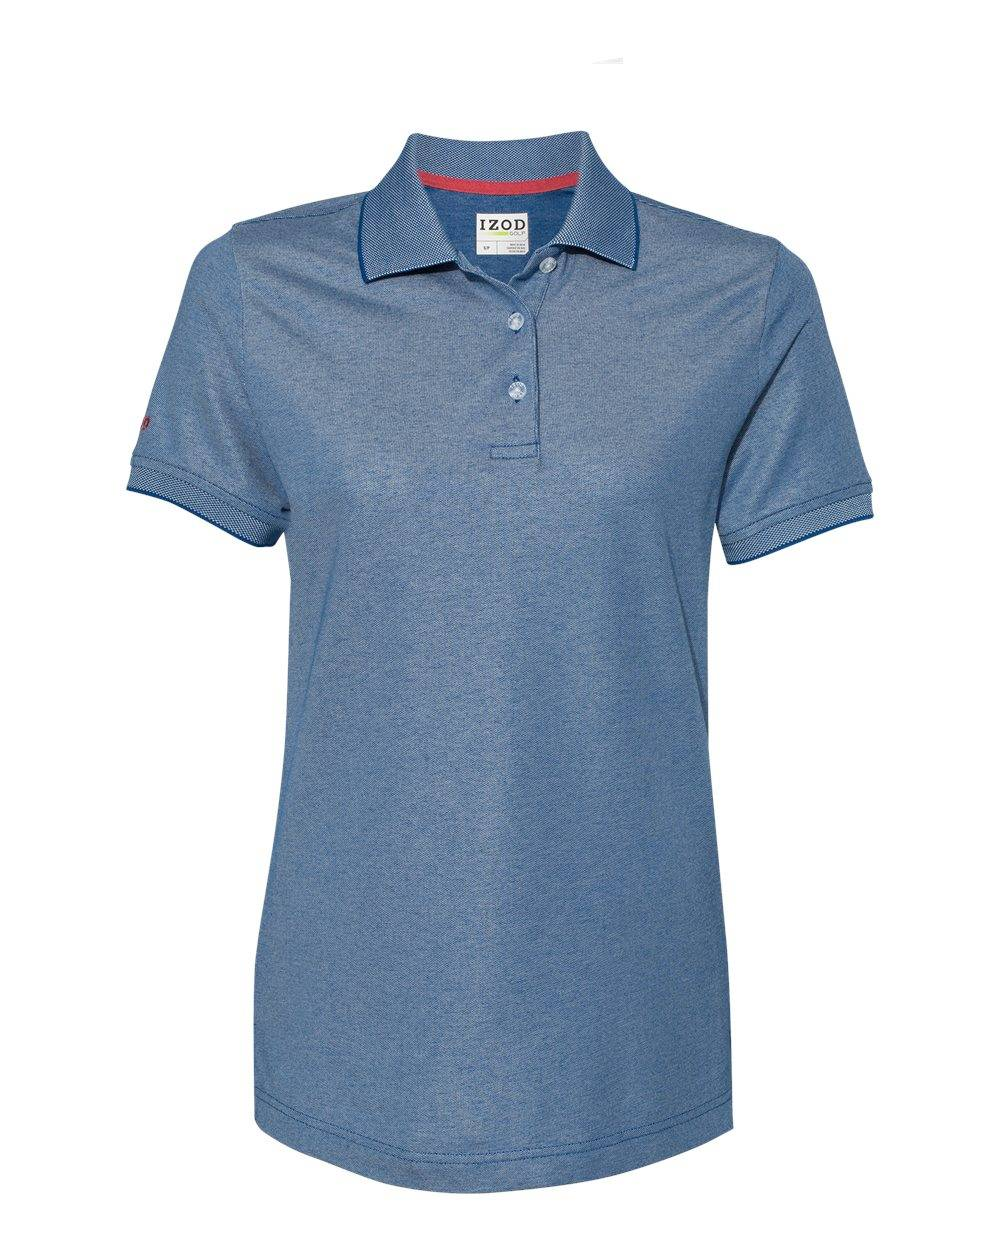 IZOD - Women's Advantage Performance Sport Shirt - 13GK462 - True Blue - Large